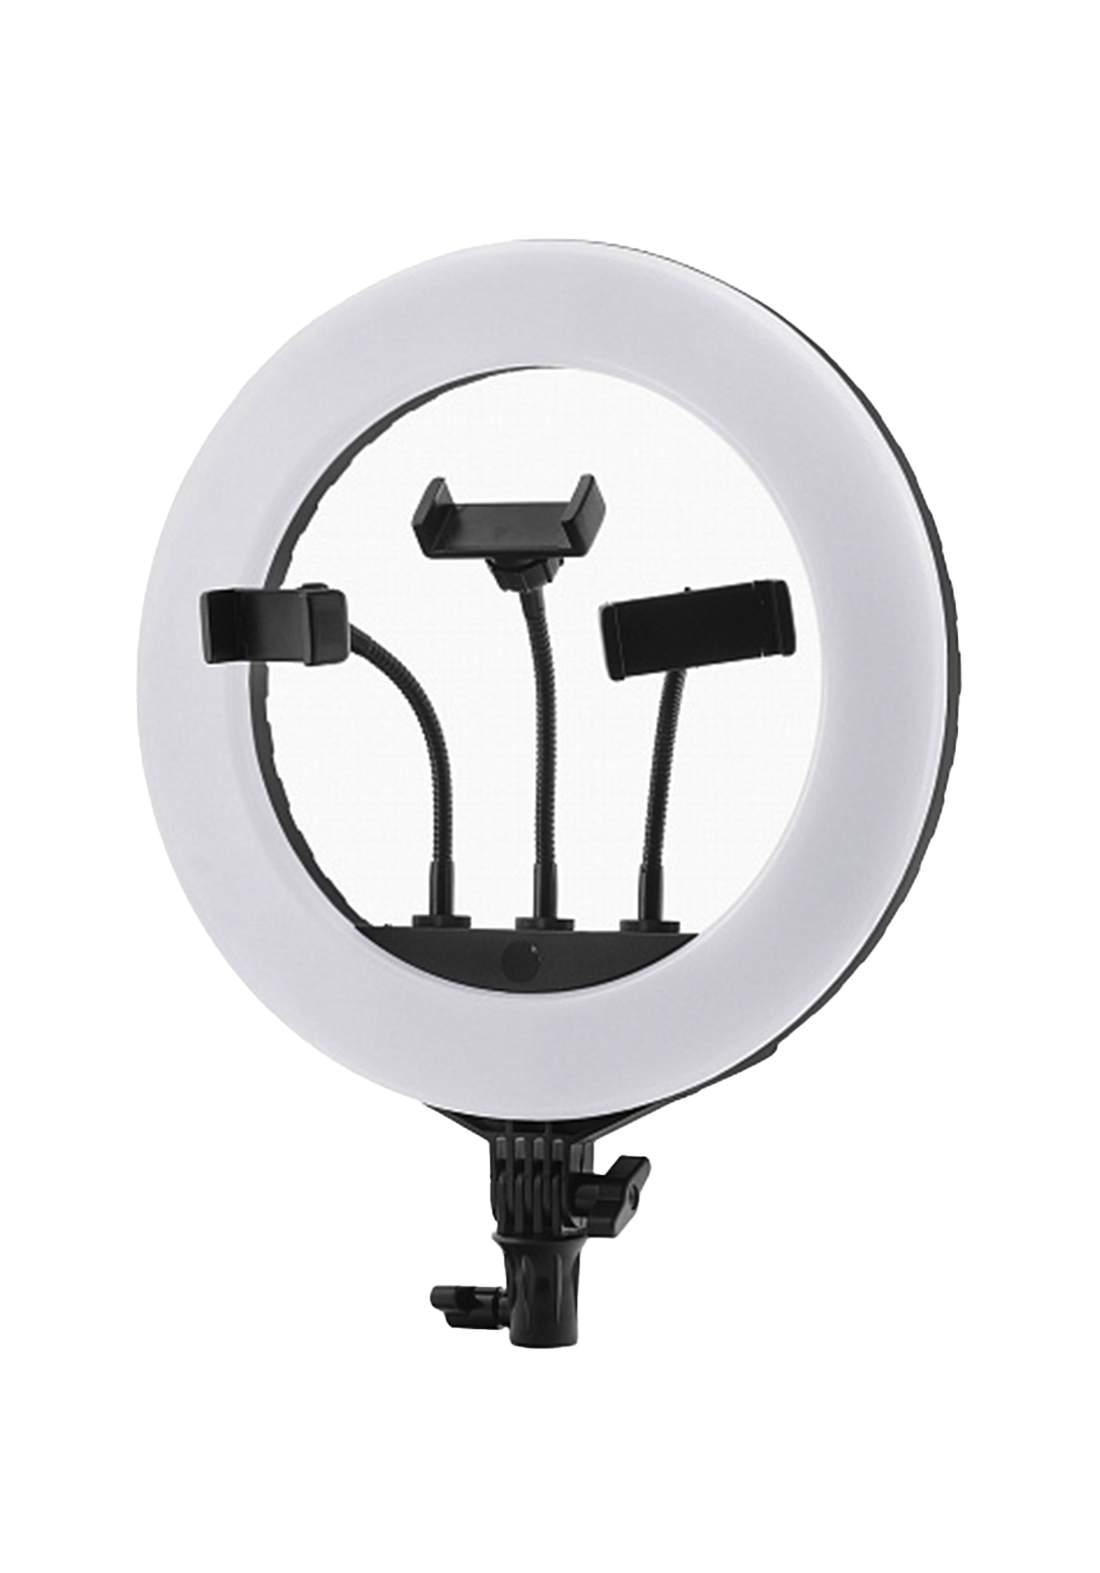 Jmary FM-18R 18 inch Ring lamp With Stand حلقة التصوير المضيئة